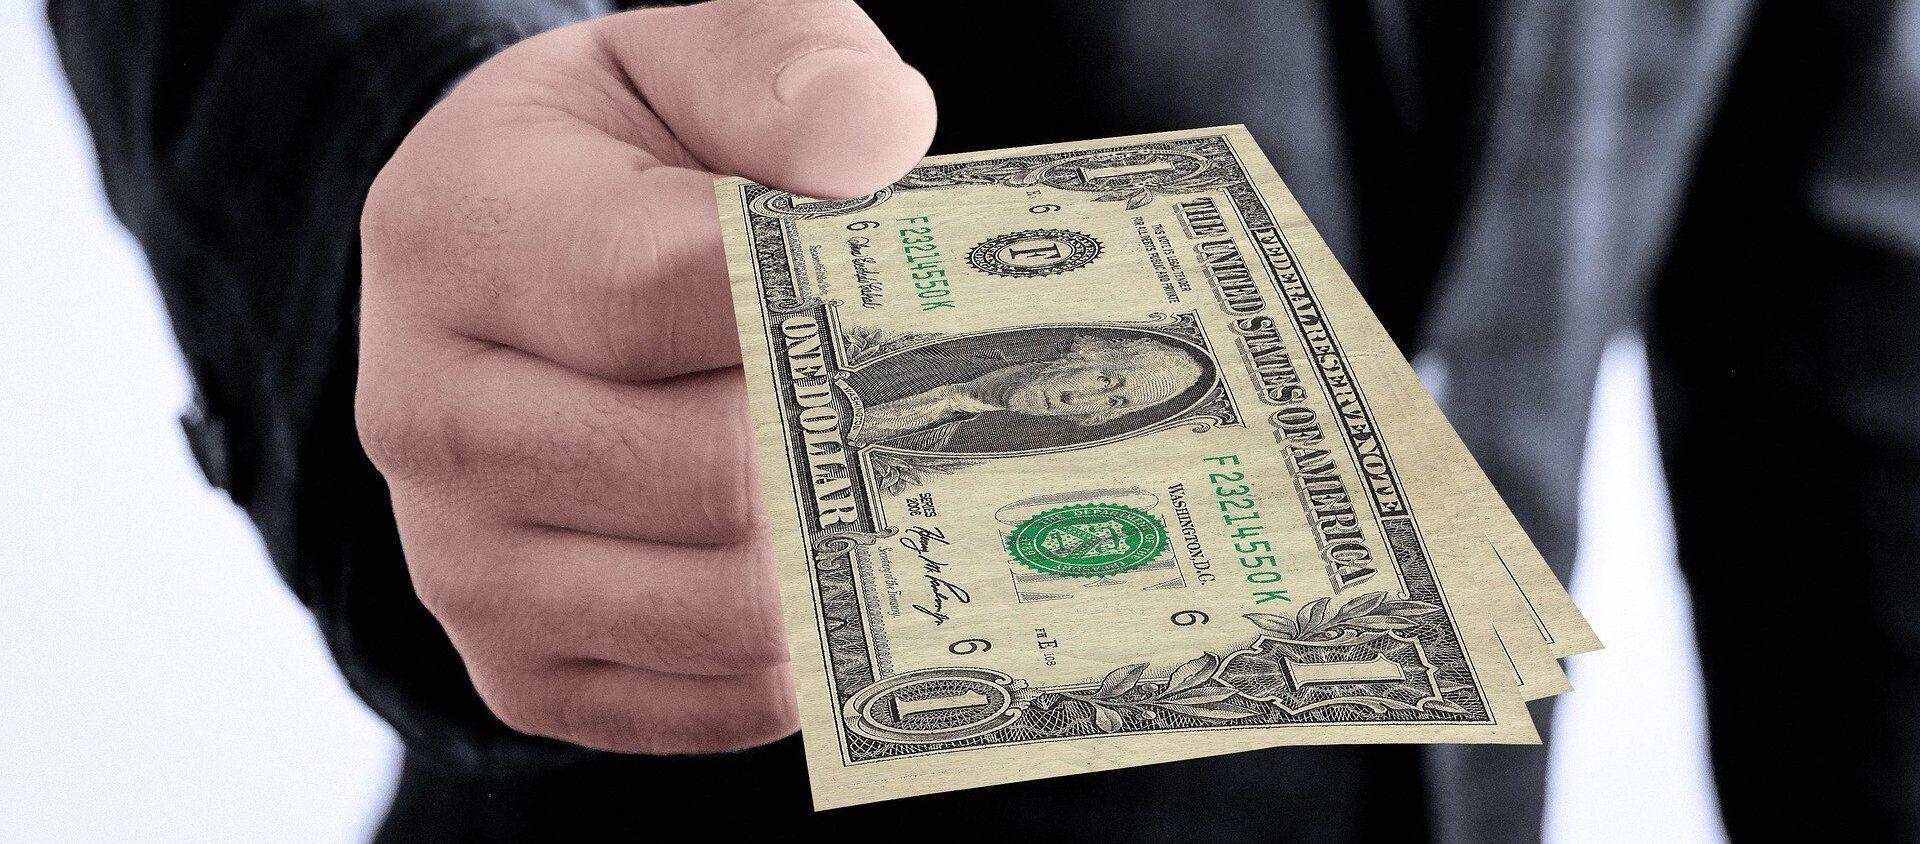 Una persona dando dinero - Sputnik Mundo, 1920, 08.12.2020